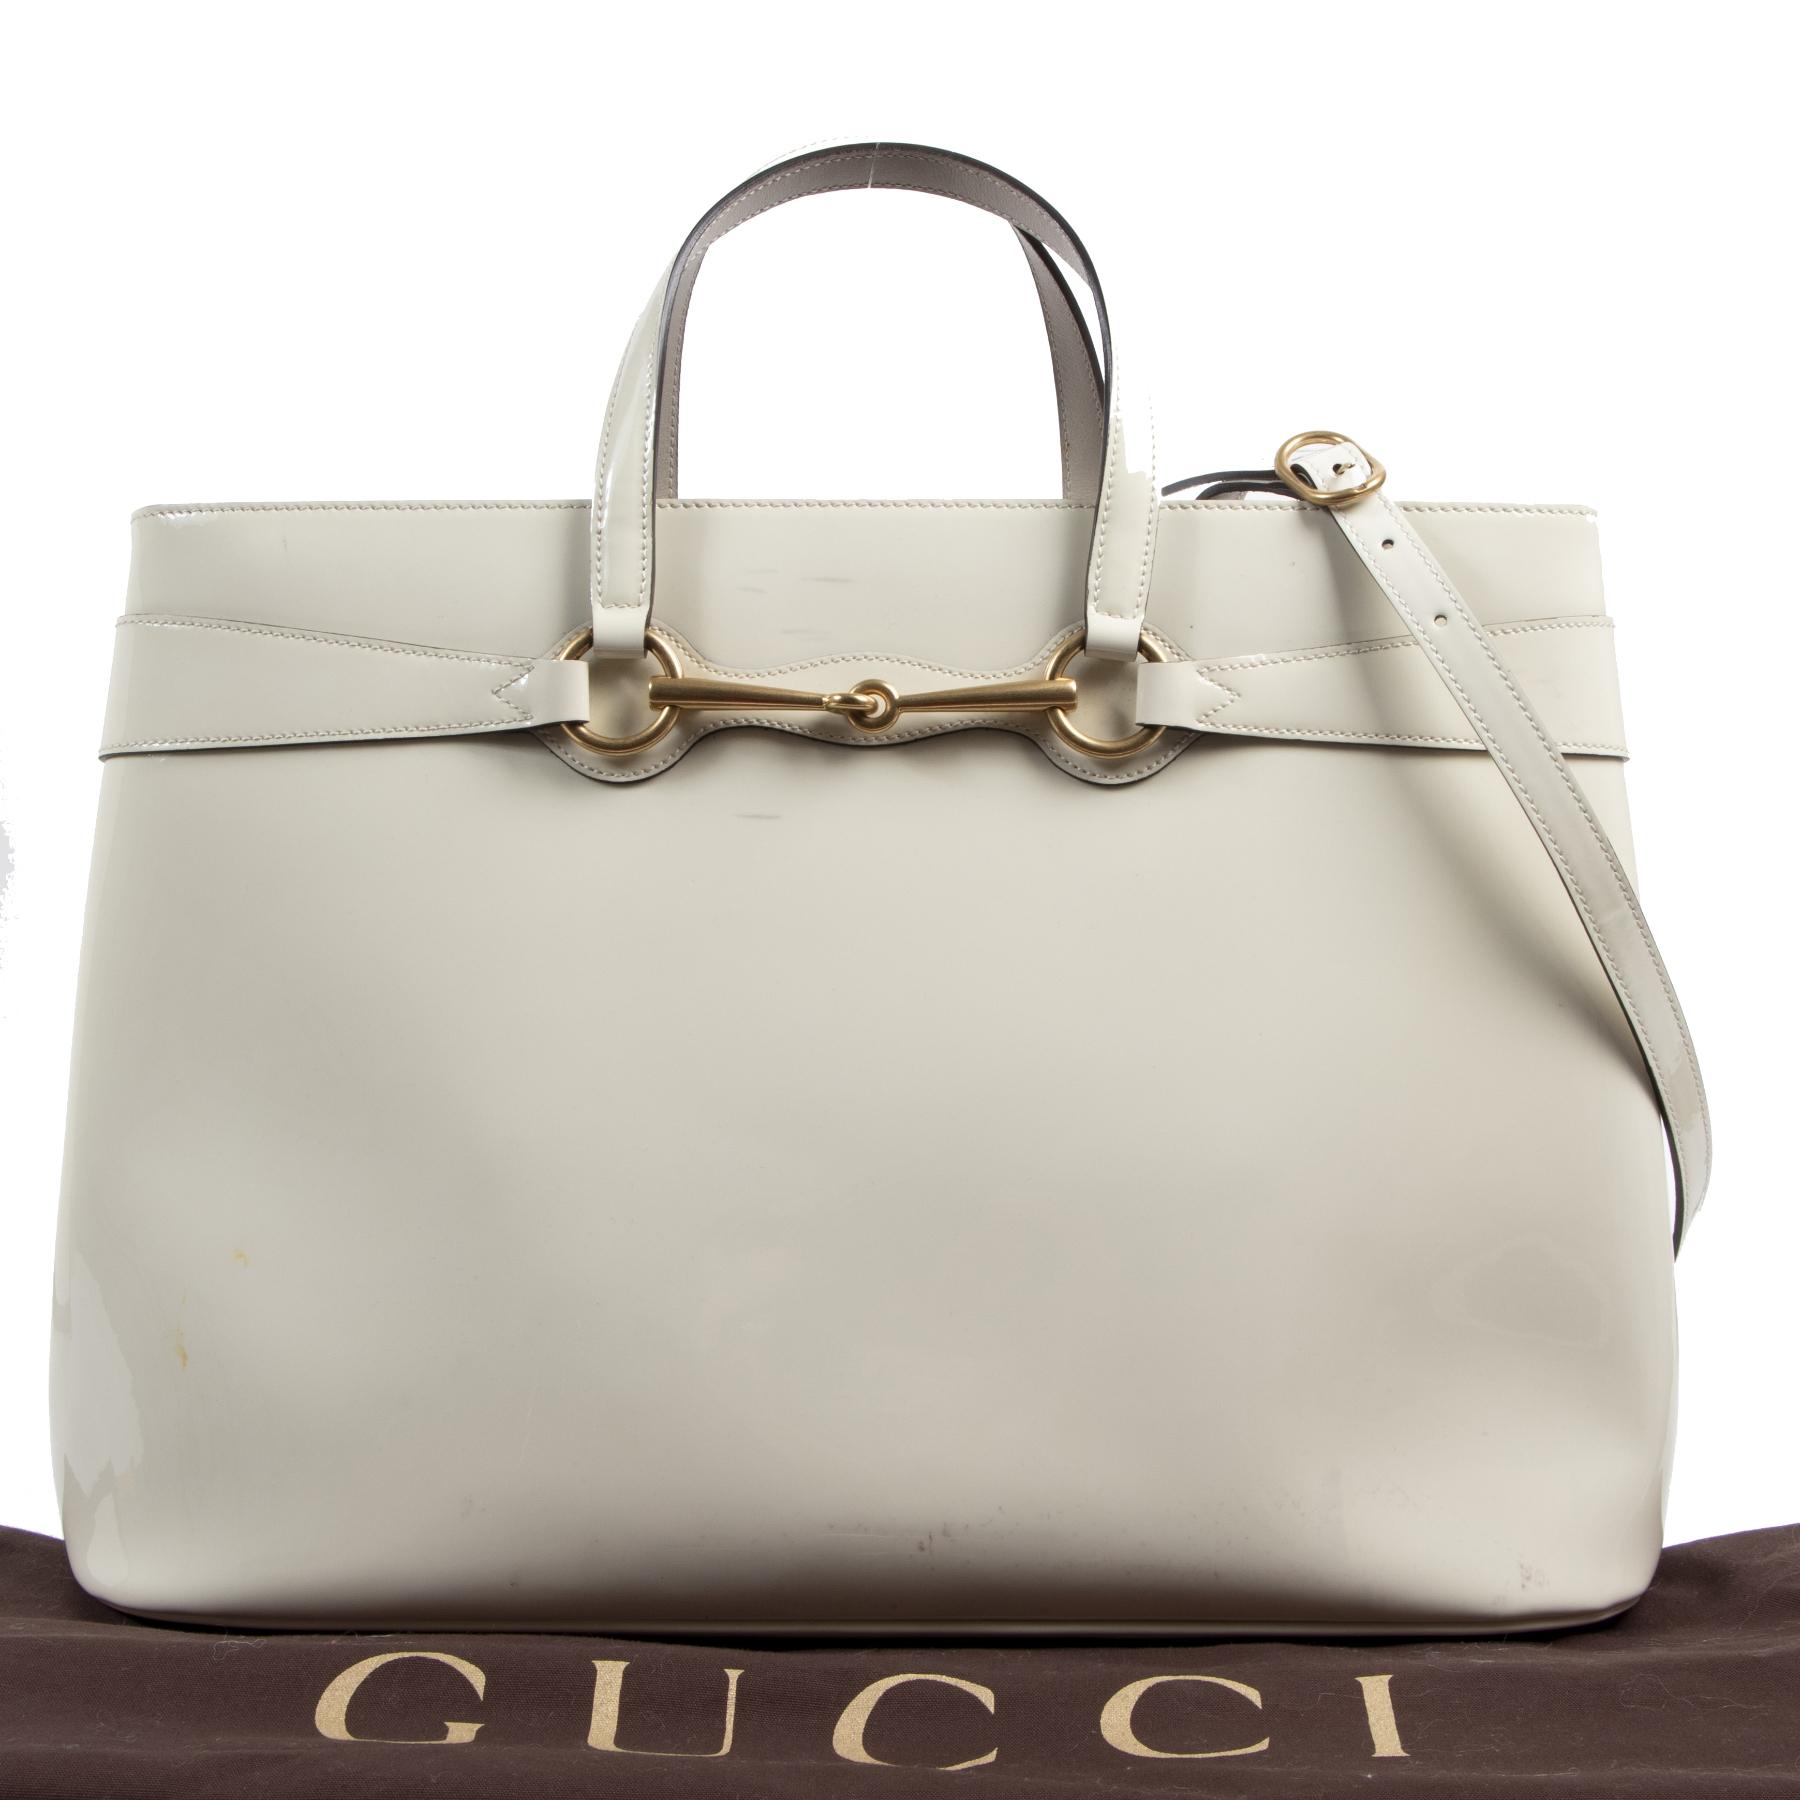 Authentieke tweedehands vintage Gucci White Horsebit Convertible Bag koop online webshop LabelLOV